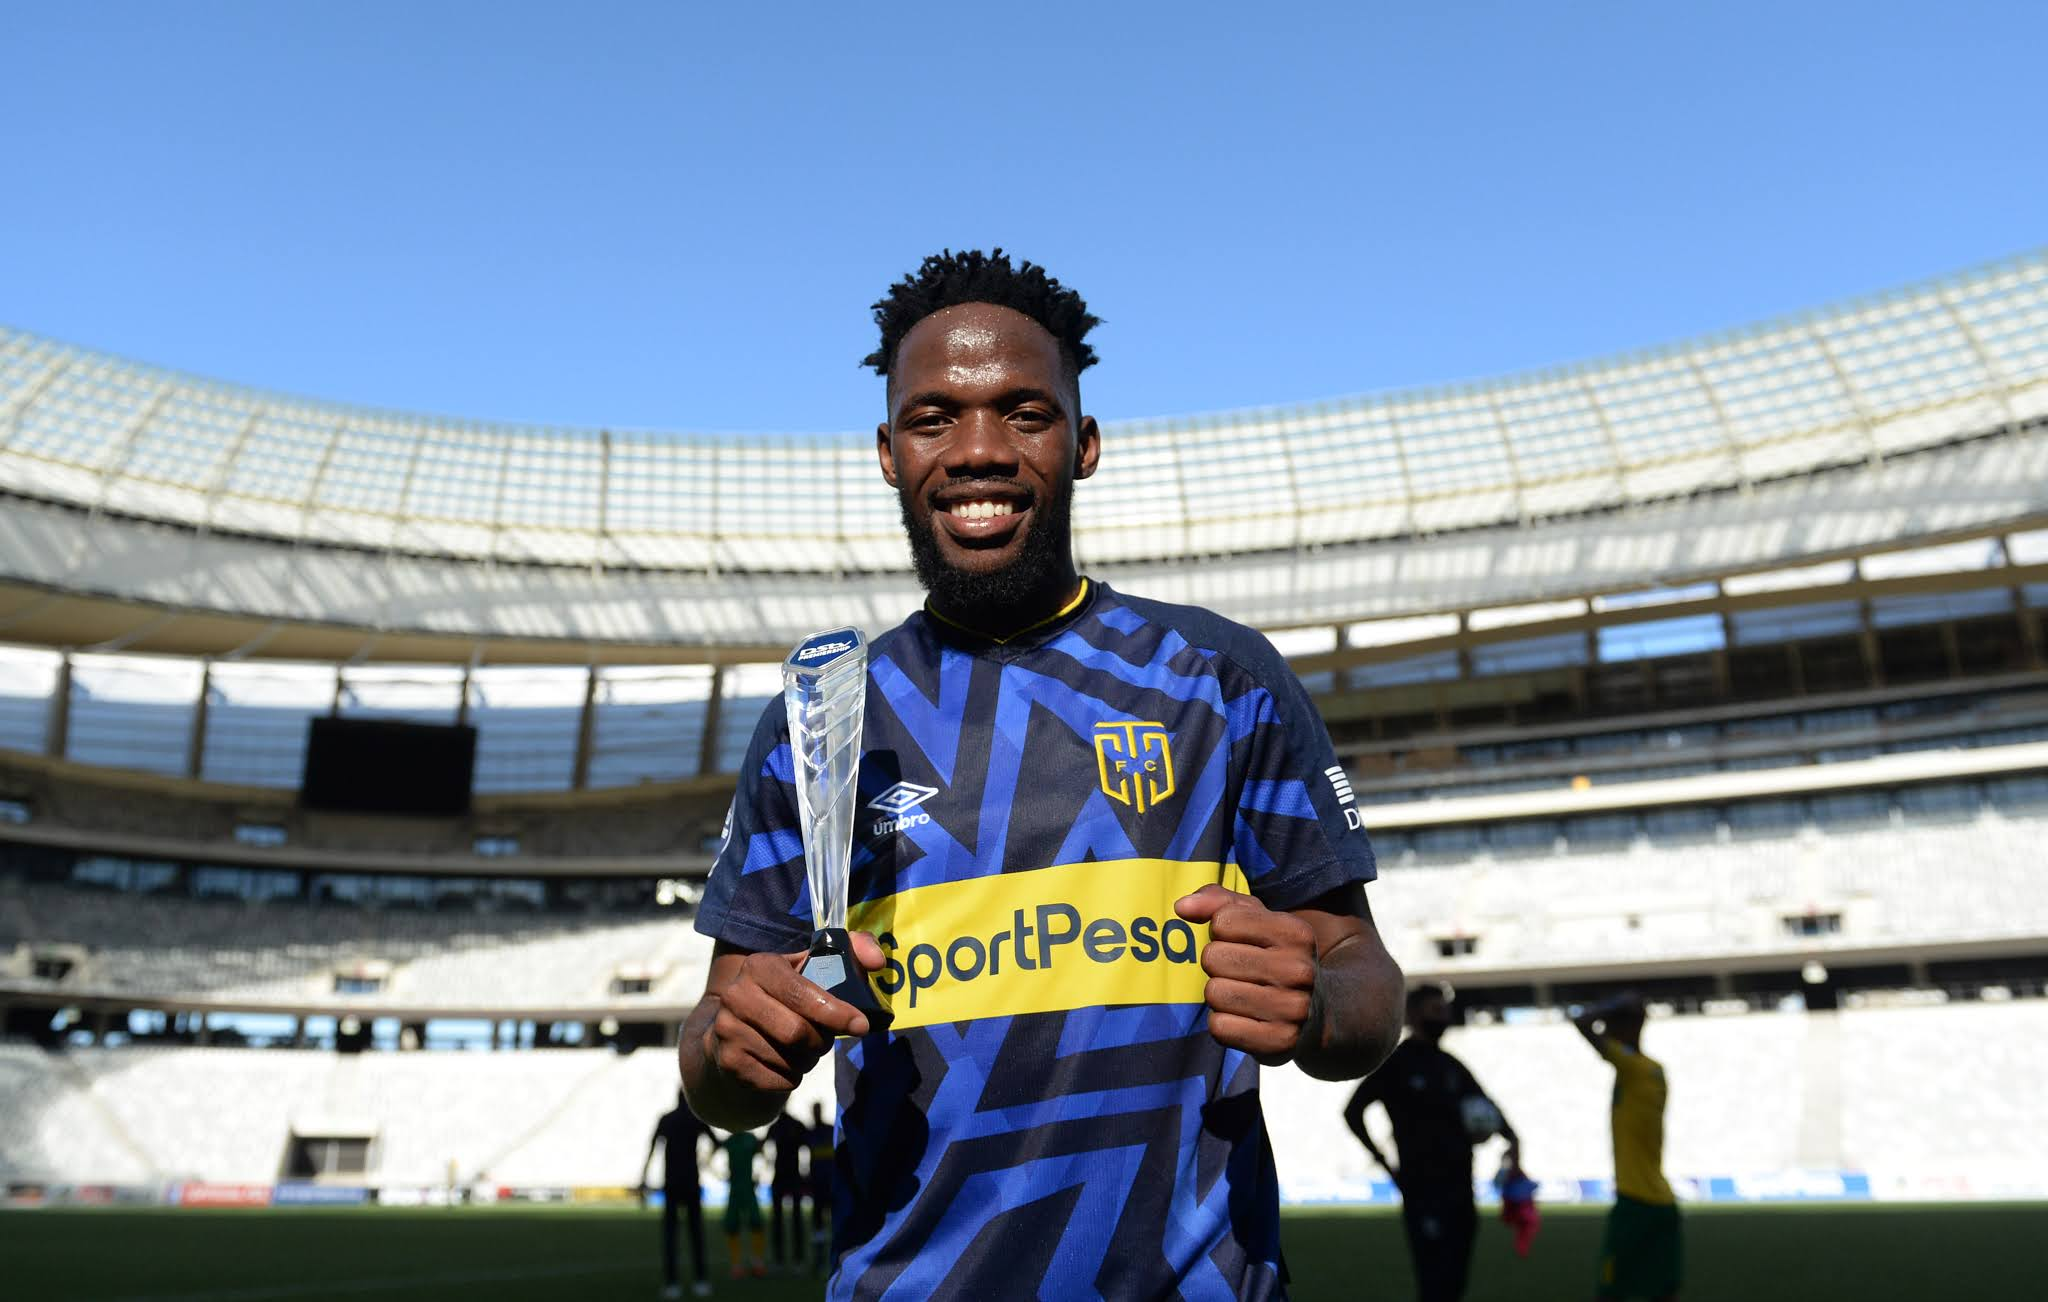 Cape Town City's attacking midfielder Mduduzi Mdantsane